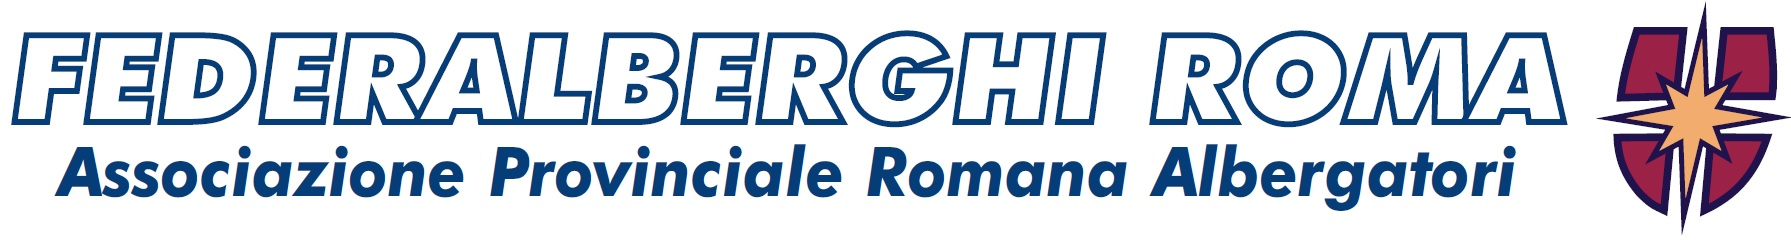 logo Federalberghi Roma